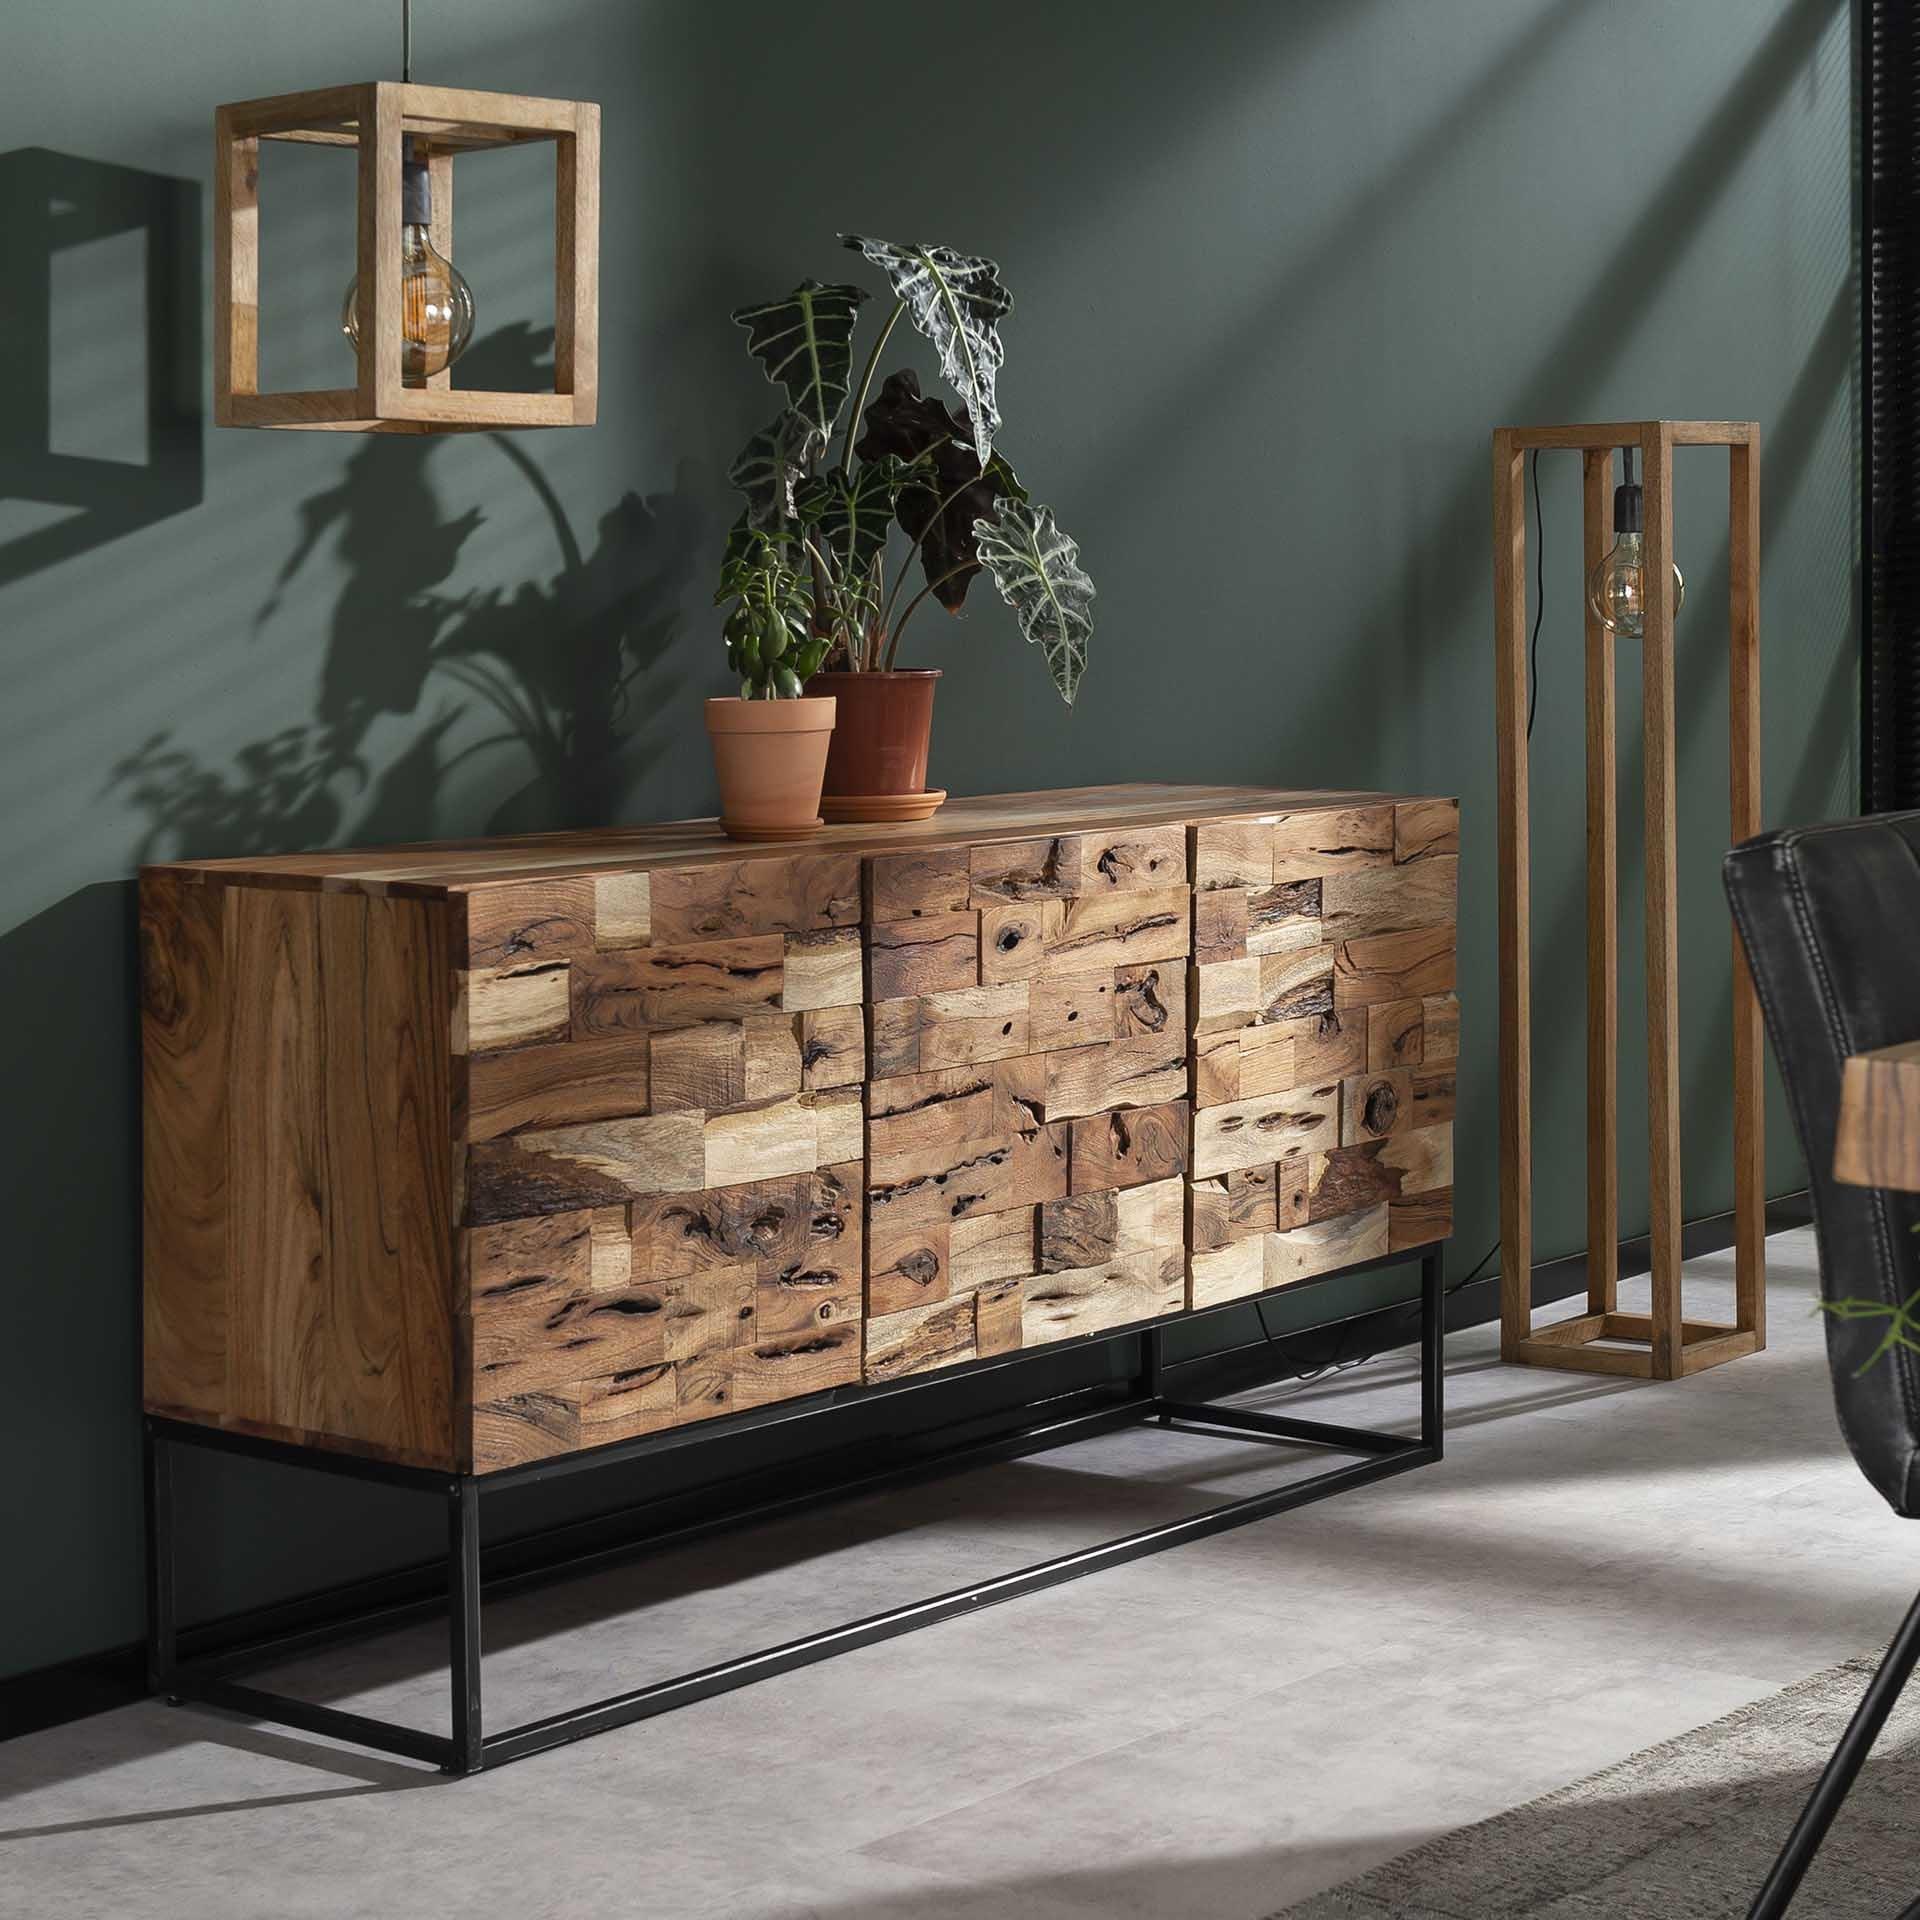 Duverger Industry Sandblast - Dressoir - acacia - gezandstraald - metalen frame - 3 deuren - L 160cm